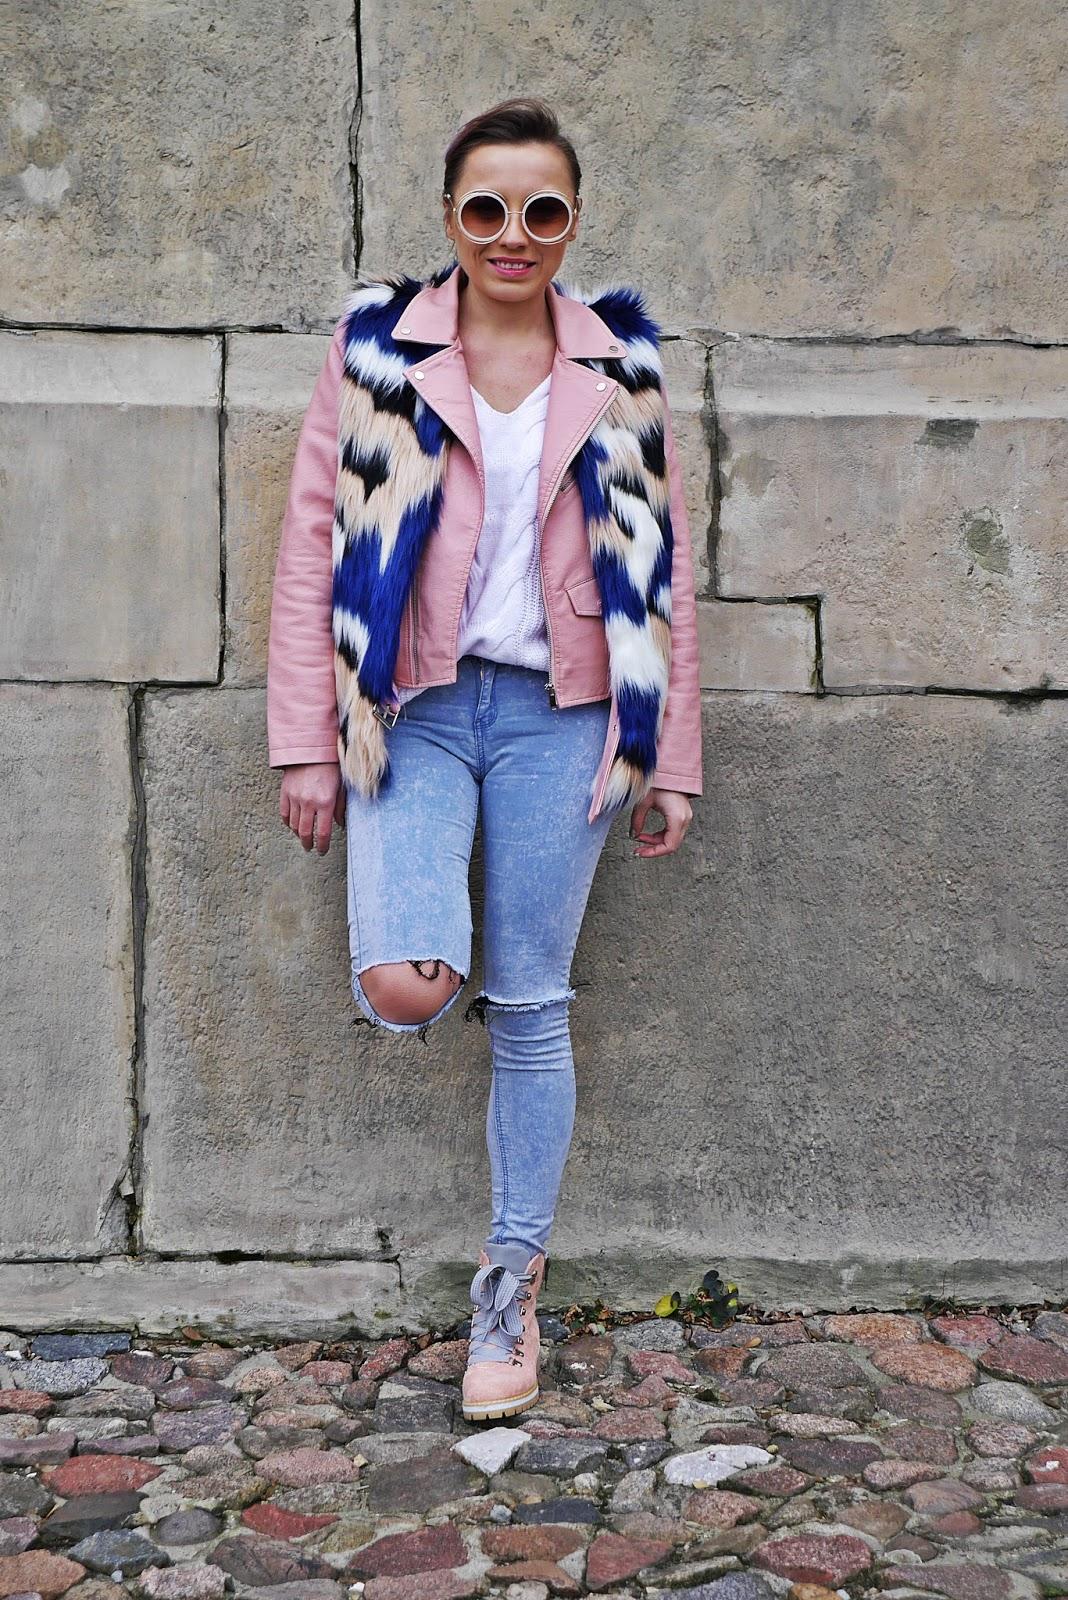 1_fur_vaist_pink_biker_jacket_jeans_buty_renee_karyn_blog_modowy_281217df